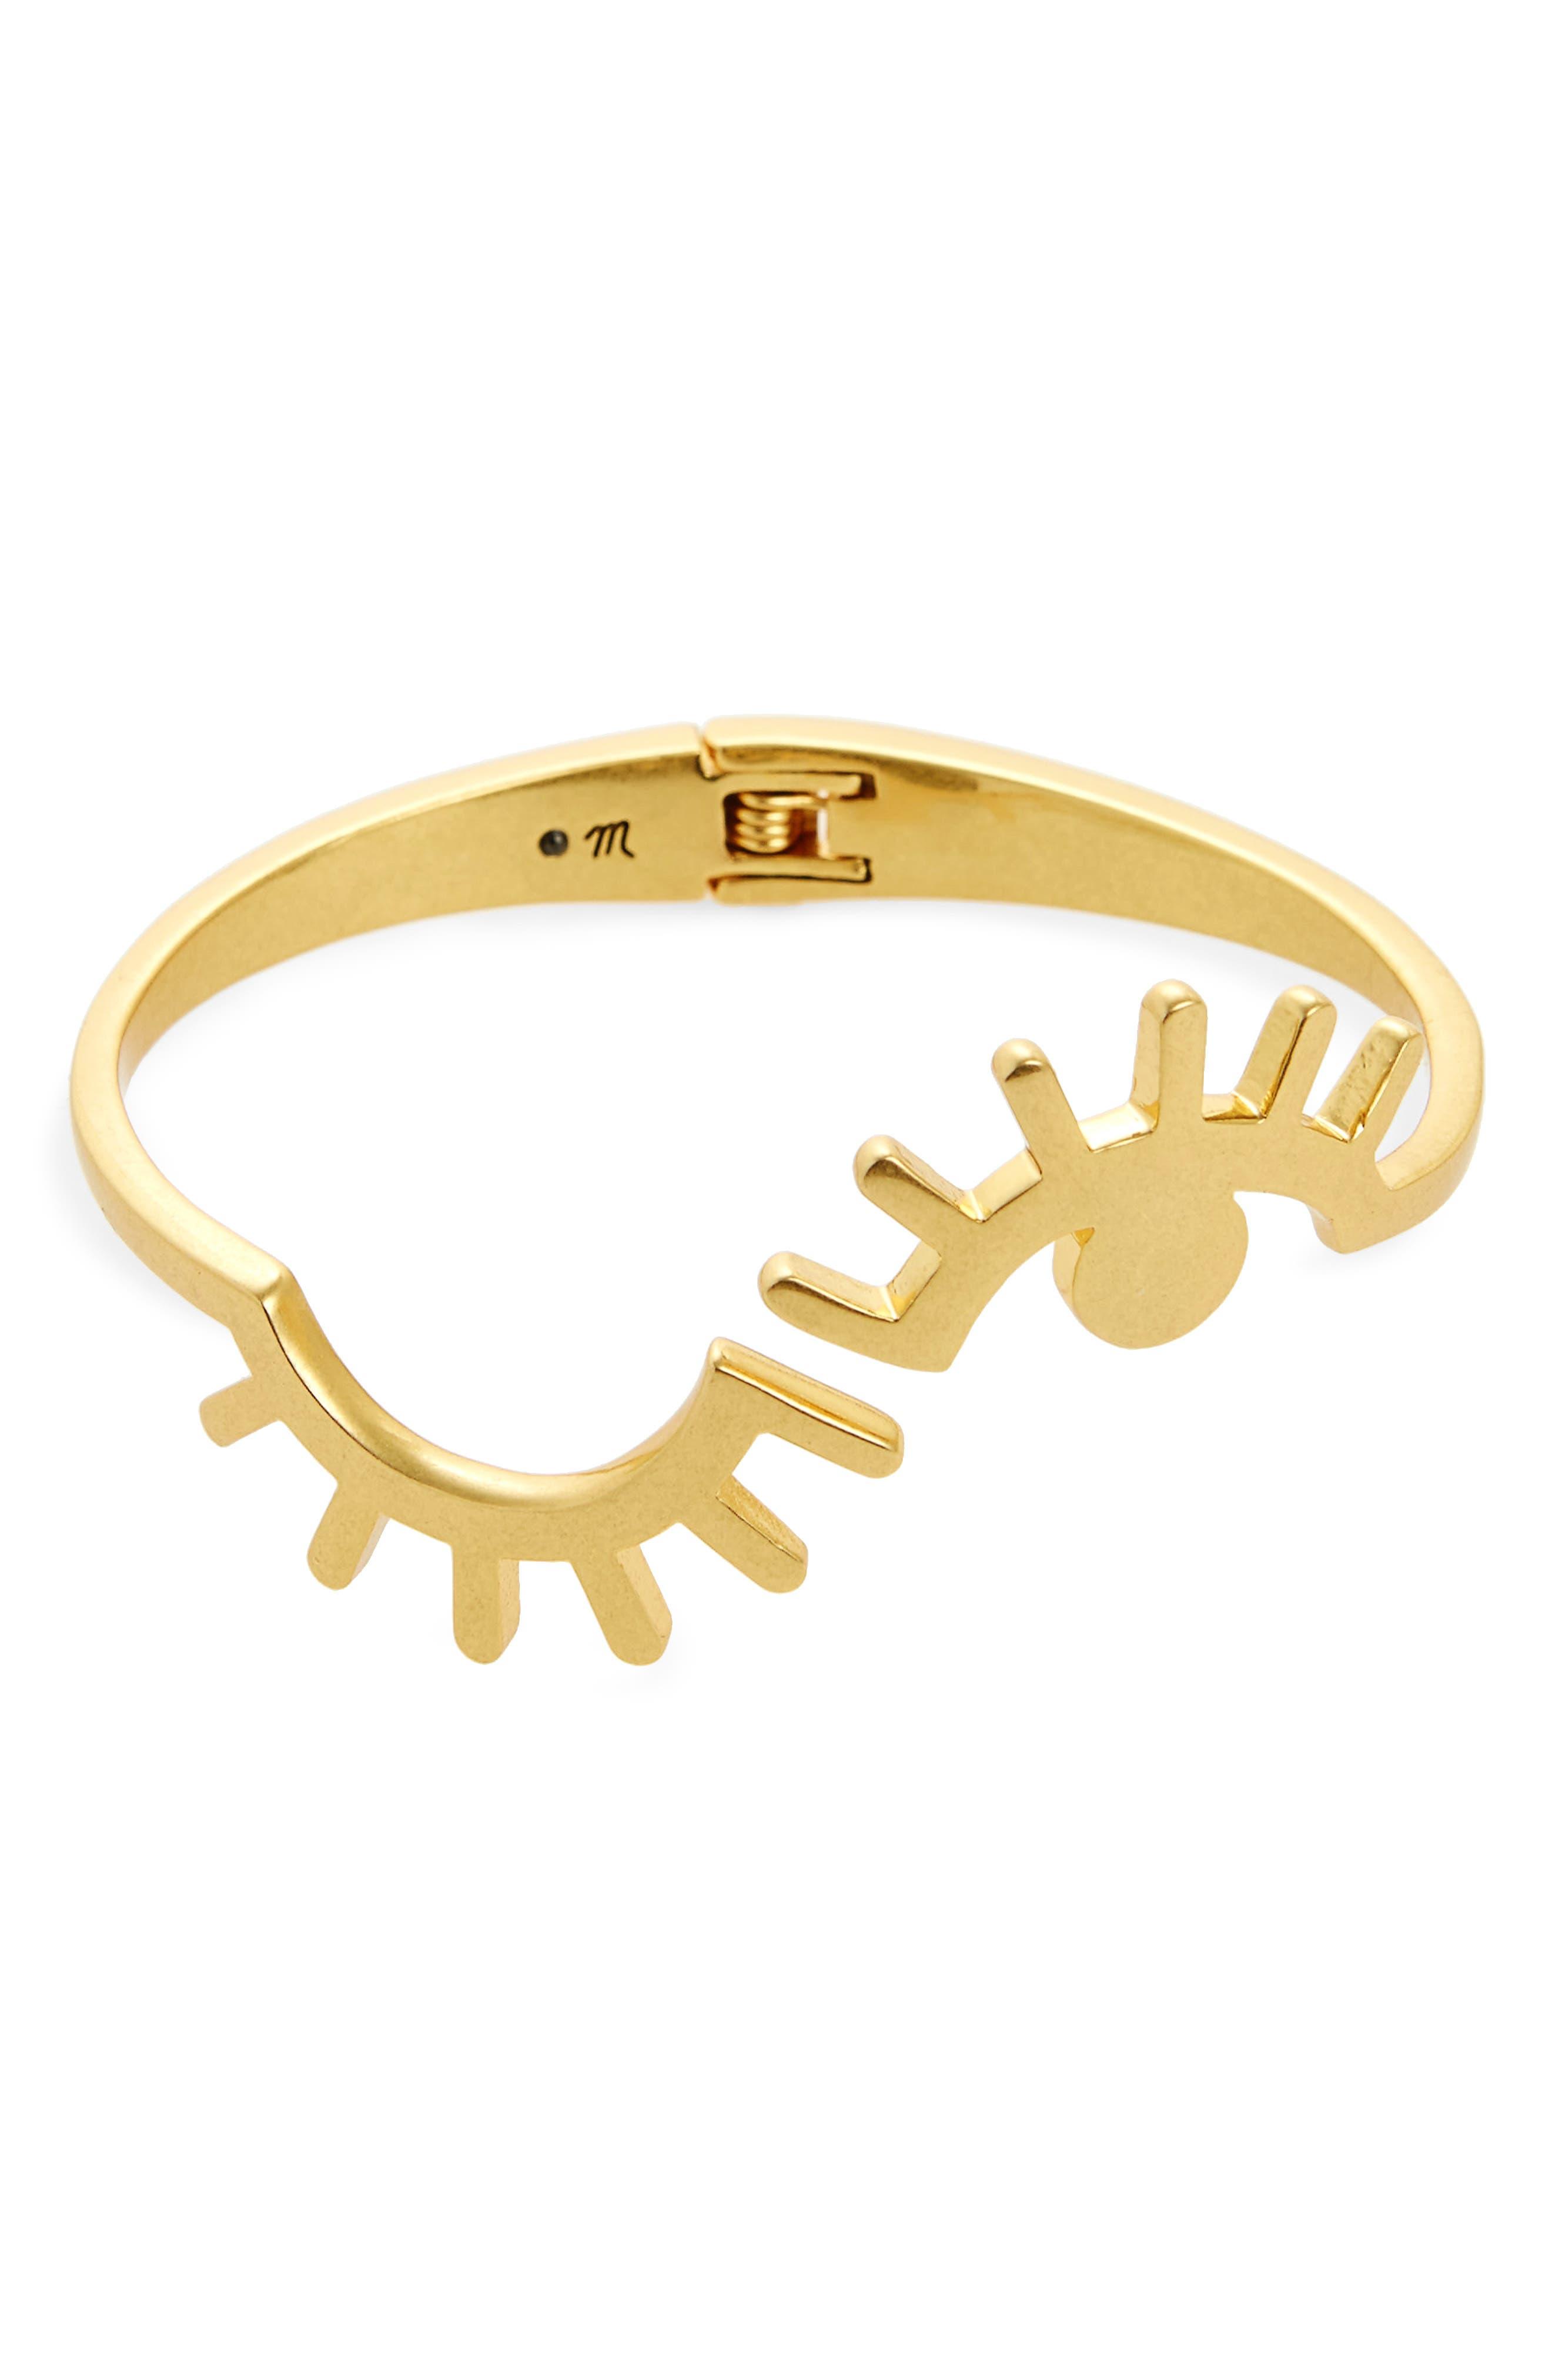 Looker Hinge Cuff Bracelet,                             Main thumbnail 1, color,                             Vintage Gold